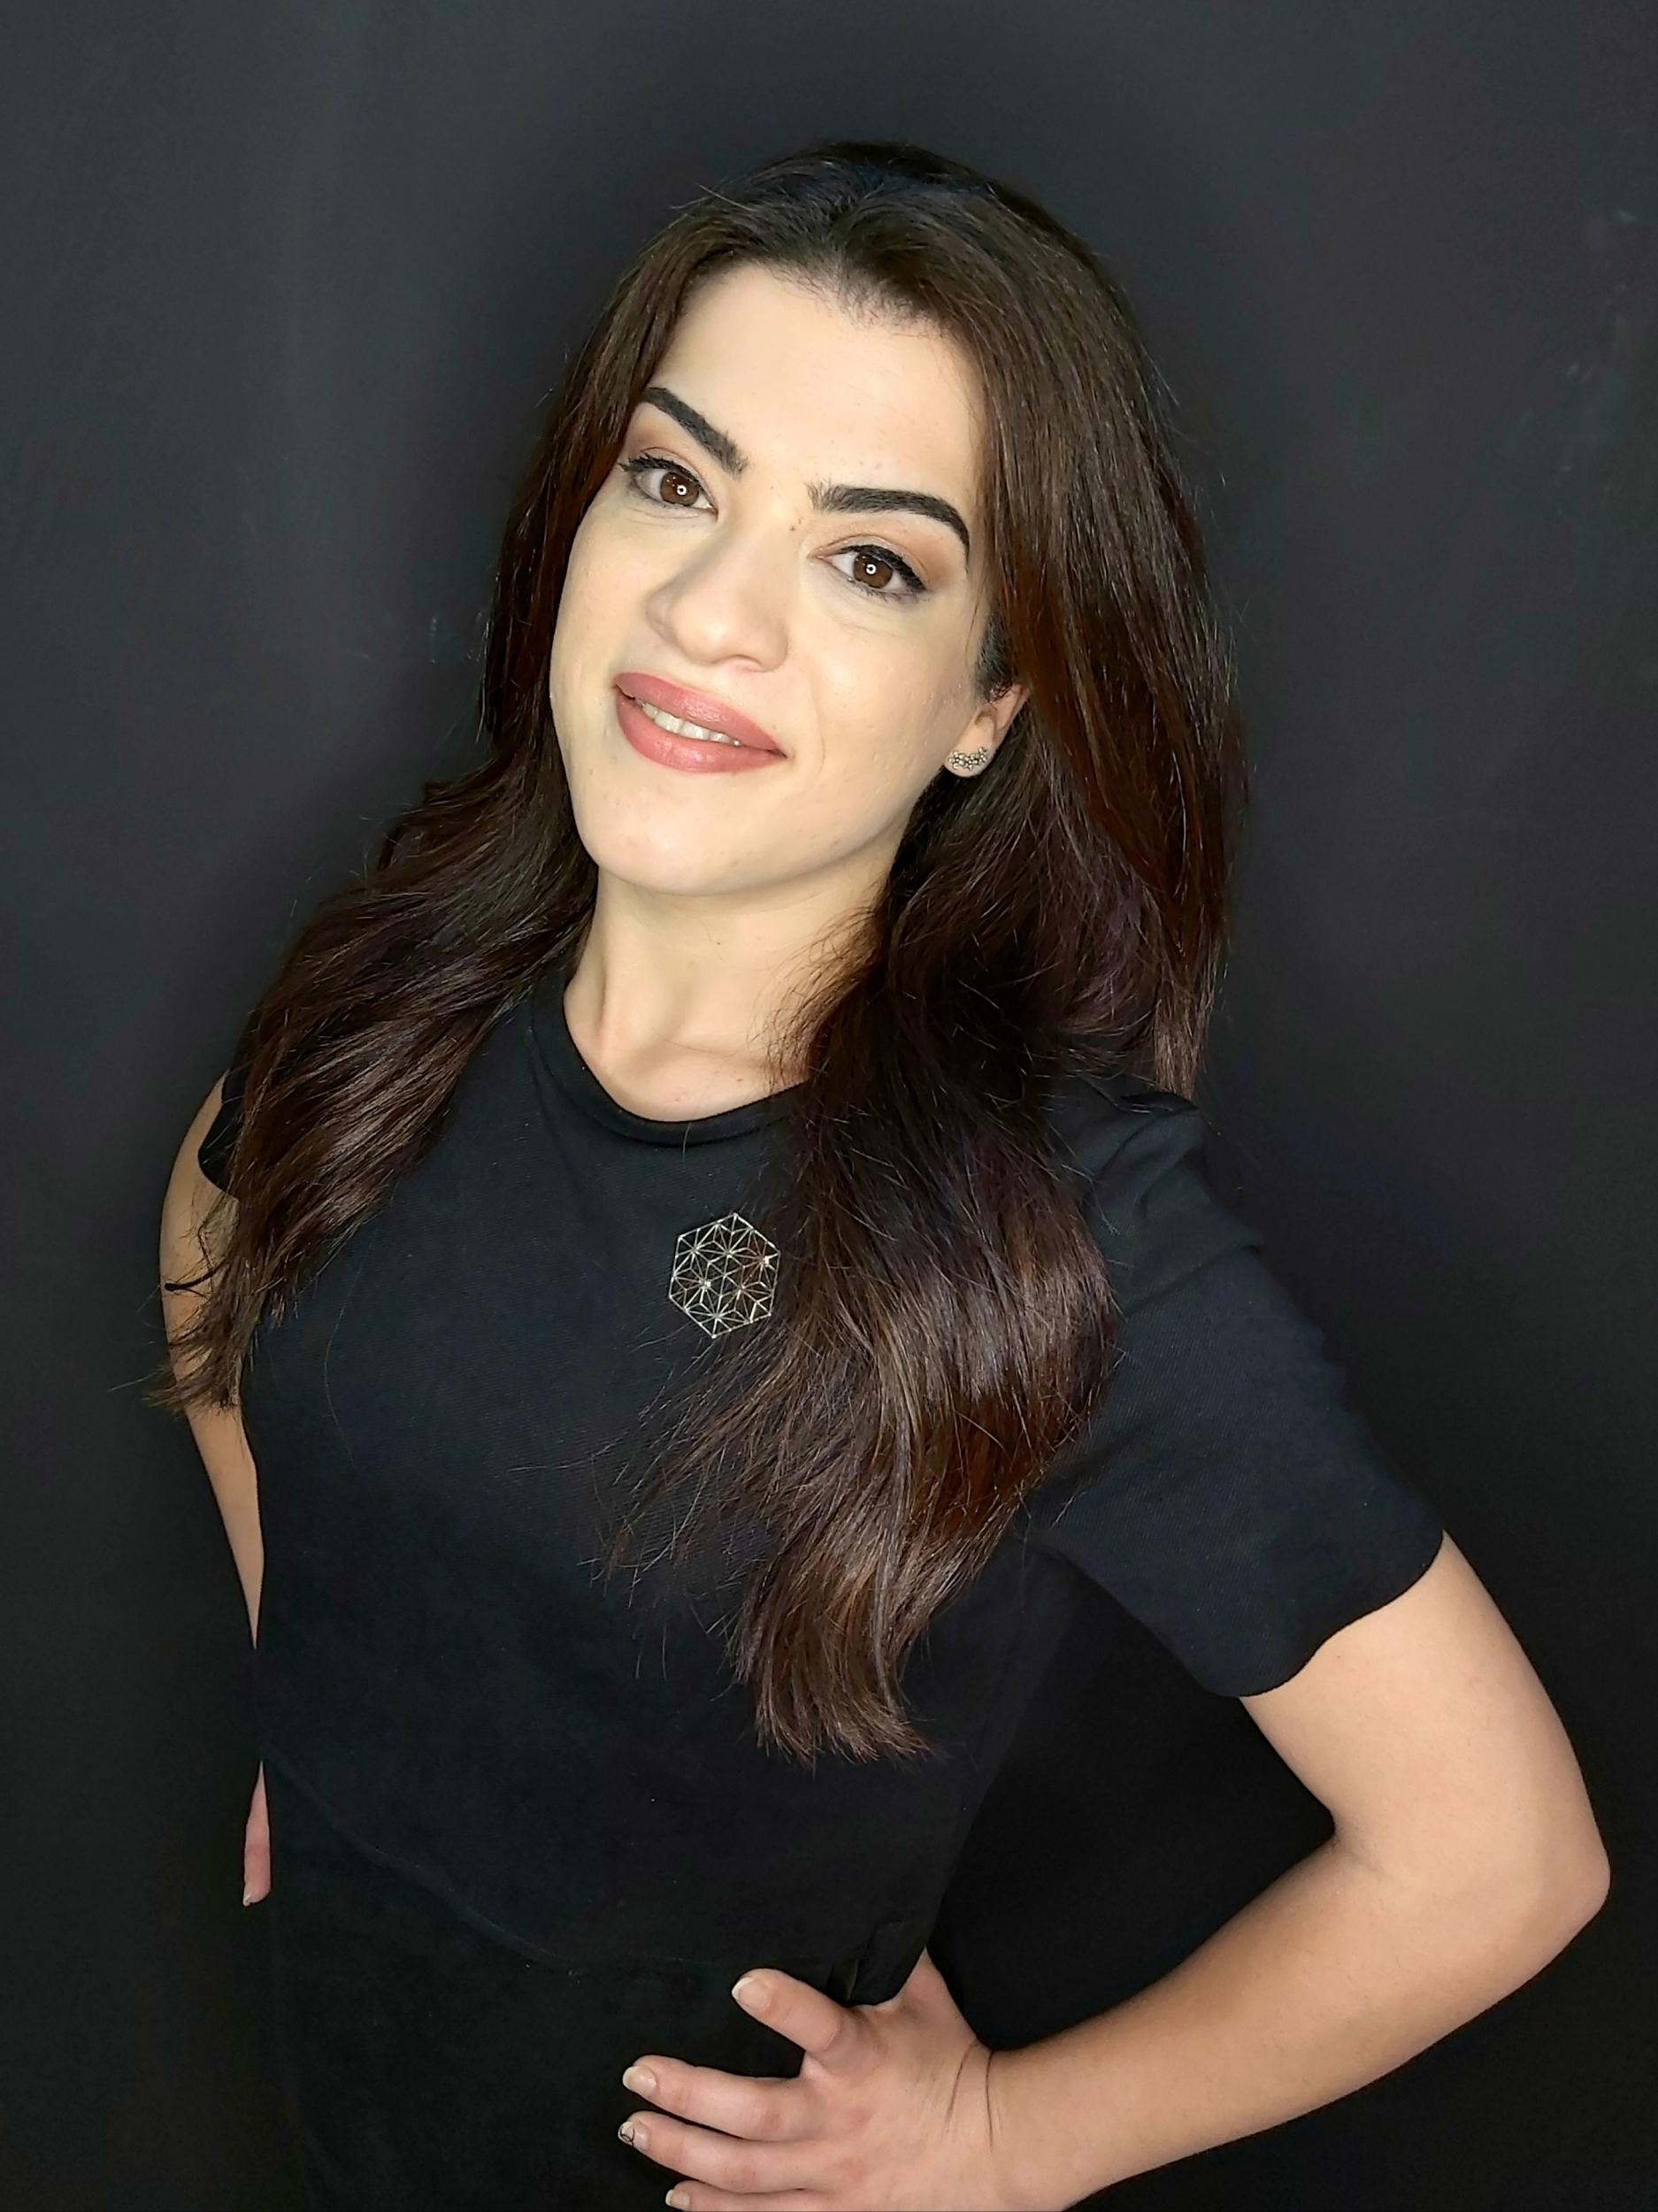 Mery Sanz